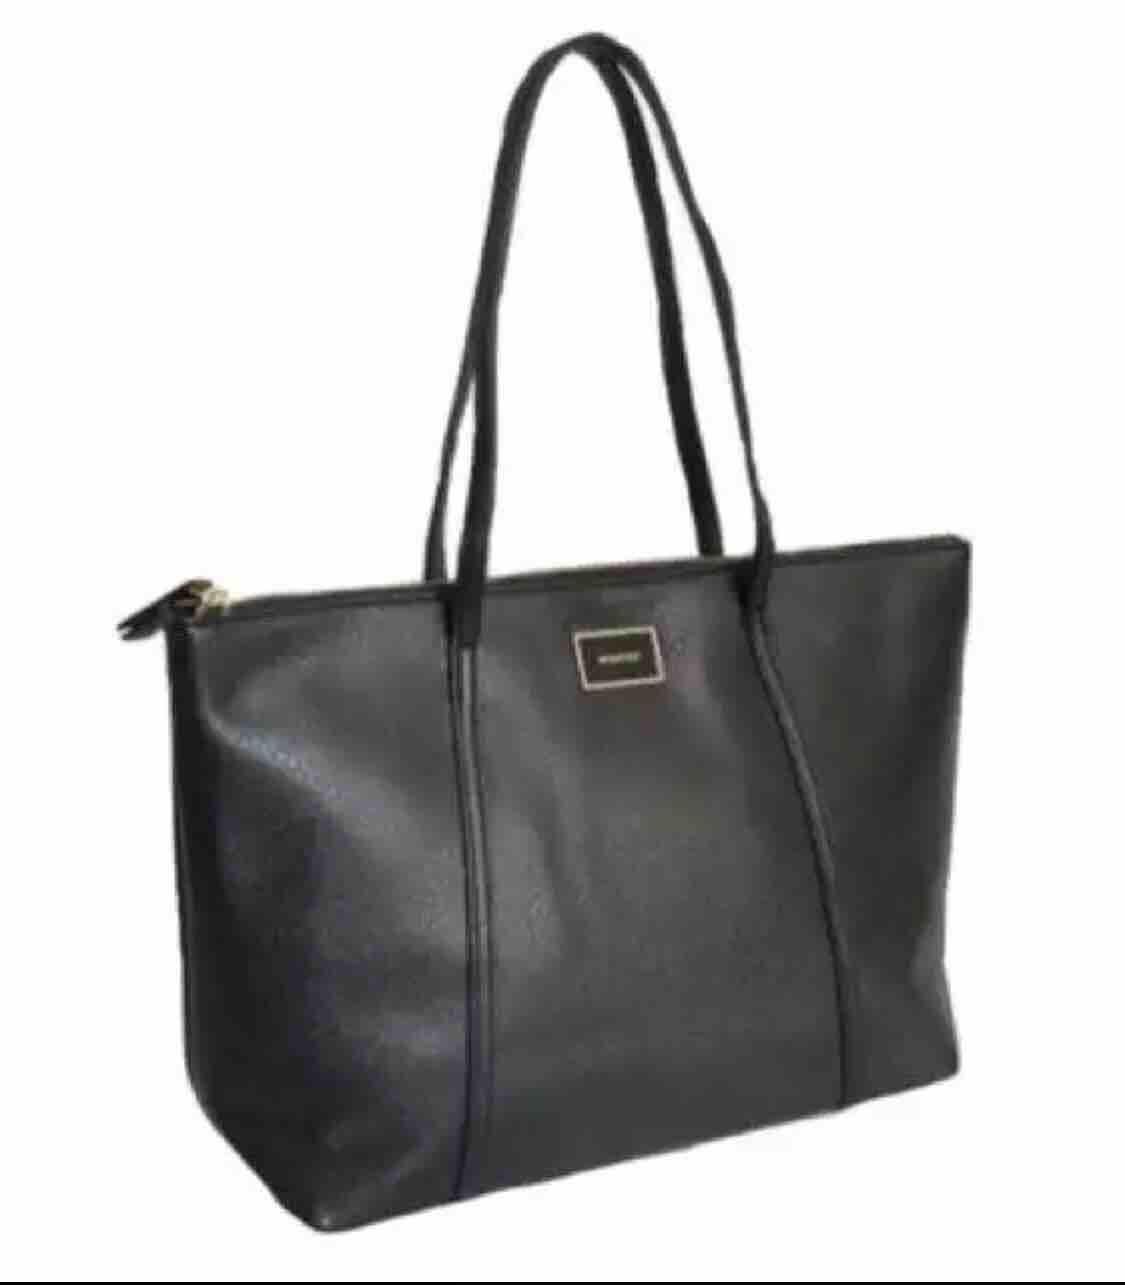 Mango Tote / Hand Bag